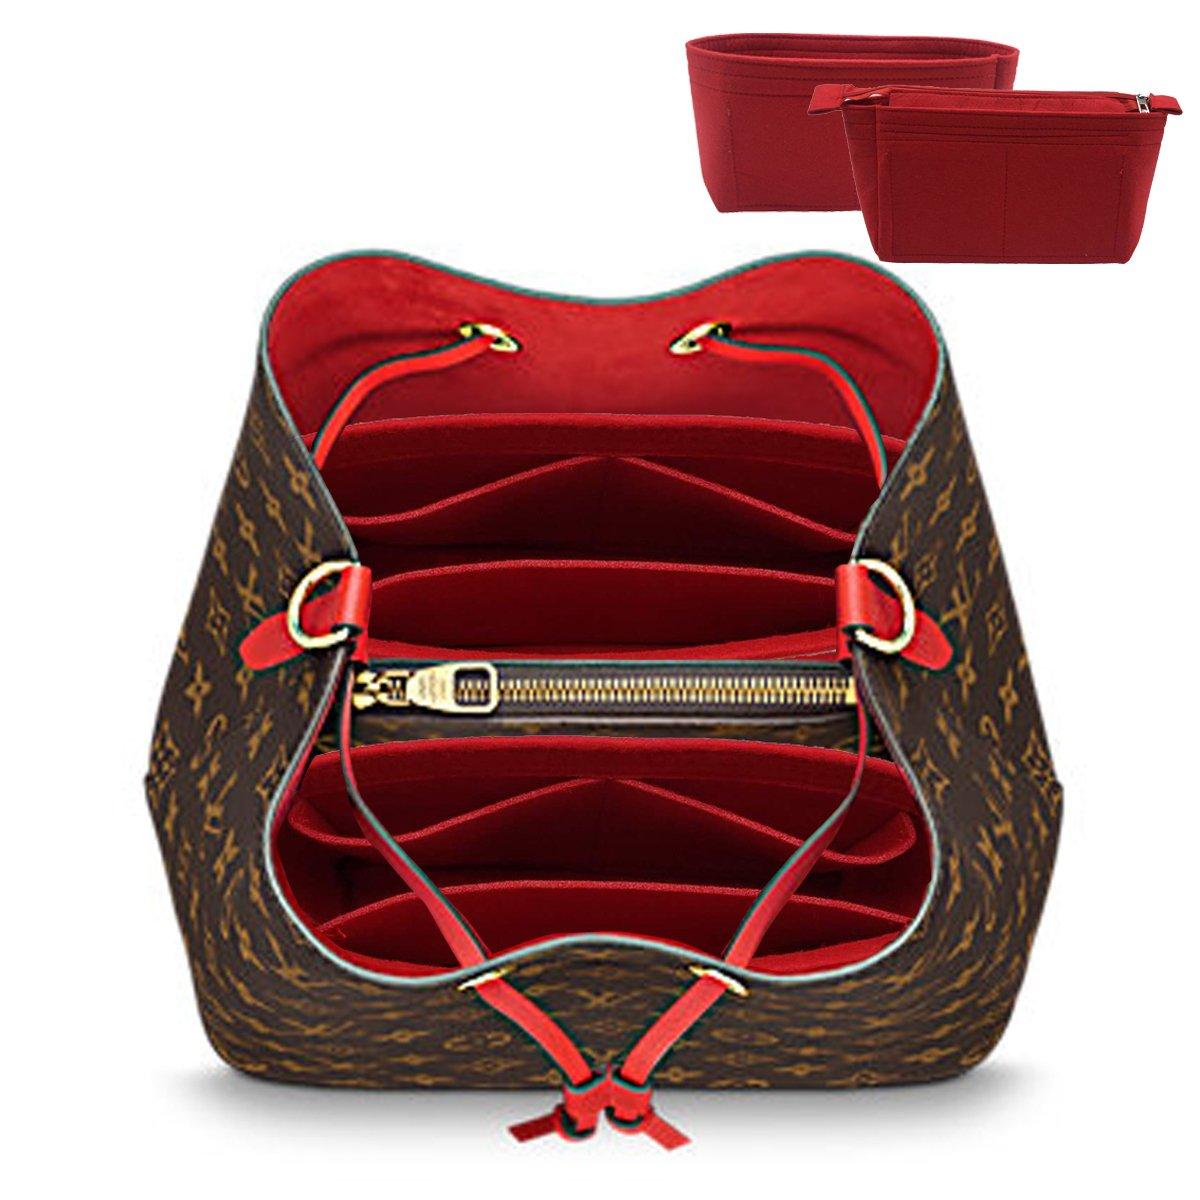 LEXSION 2-Pack Felt Handbag Organizer ,Insert purse organizer Fits LV Neonoe Perfectly Red M